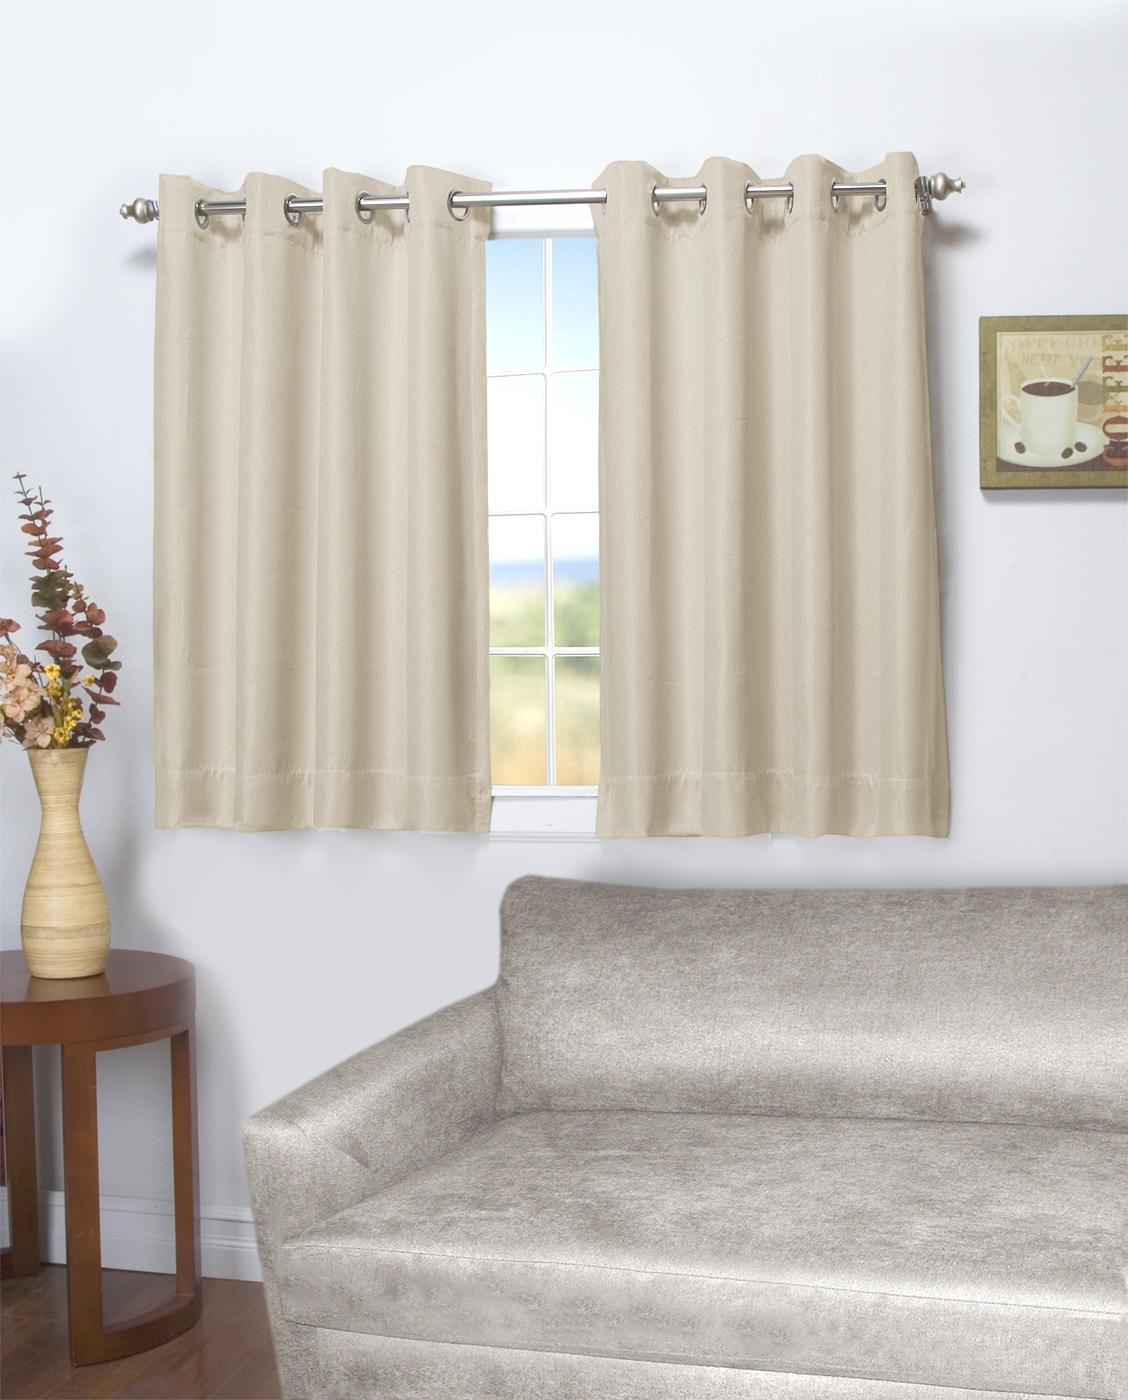 45-Inch Long Curtains - Thecurtainshop regarding Ultimate Blackout Short Length Grommet Panels (Image 3 of 30)